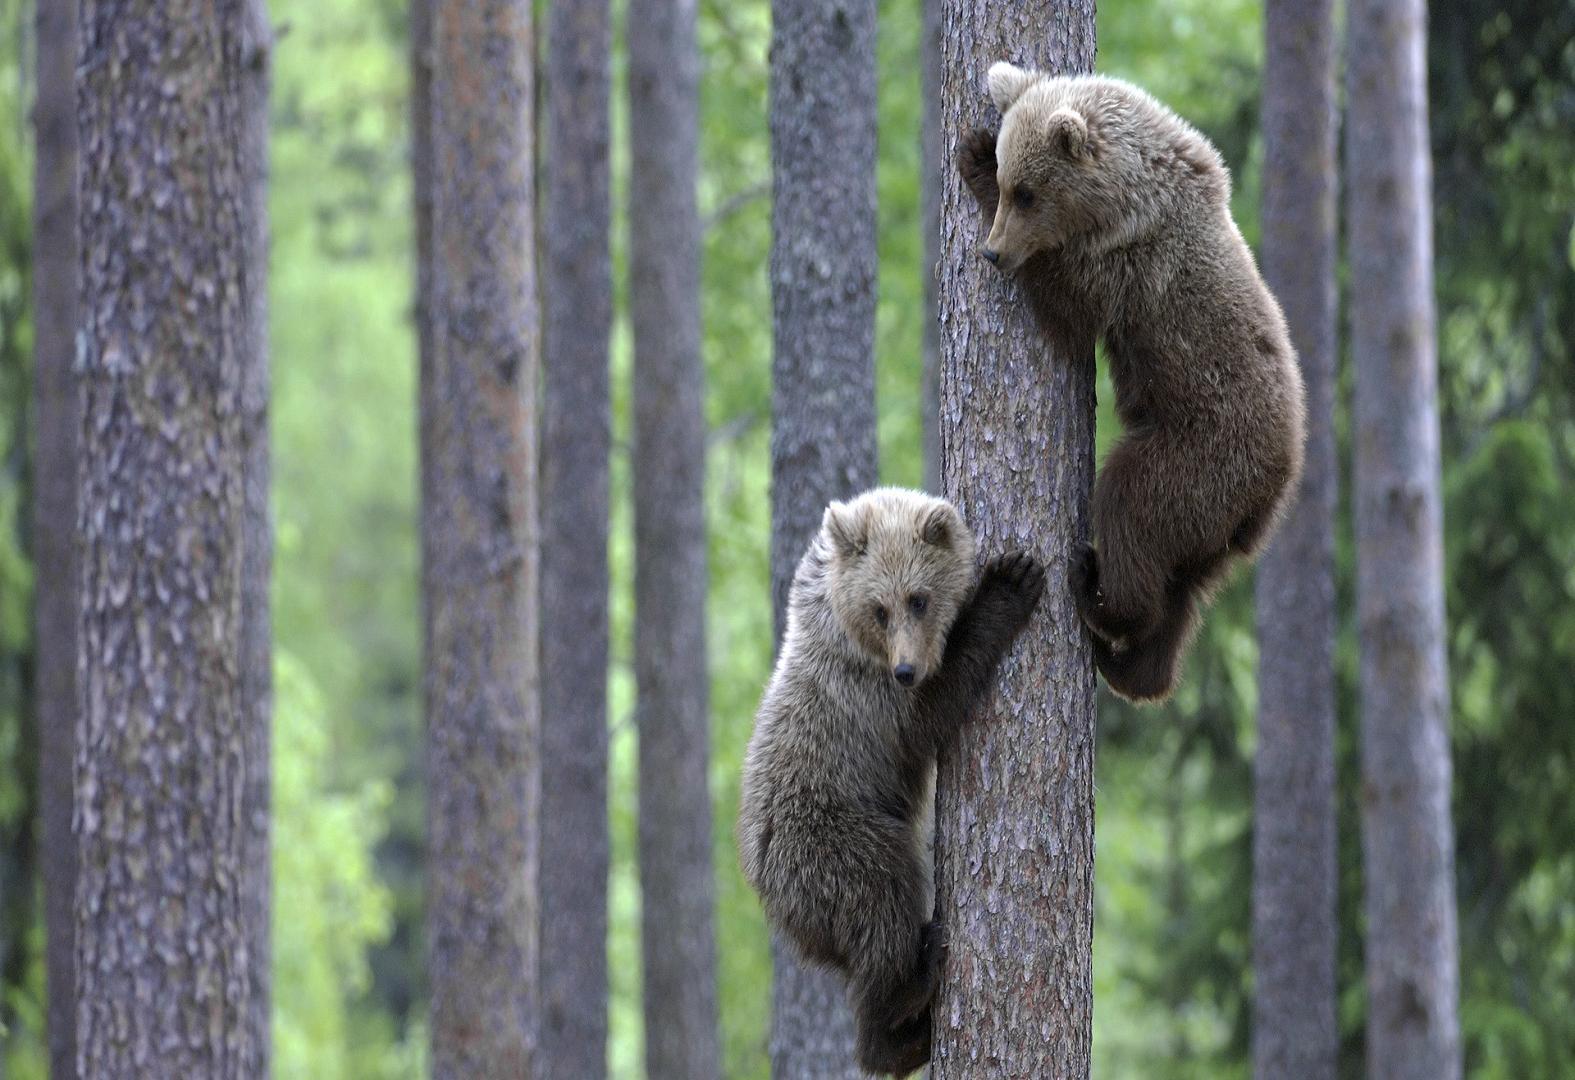 1001Places: Amazing Animals